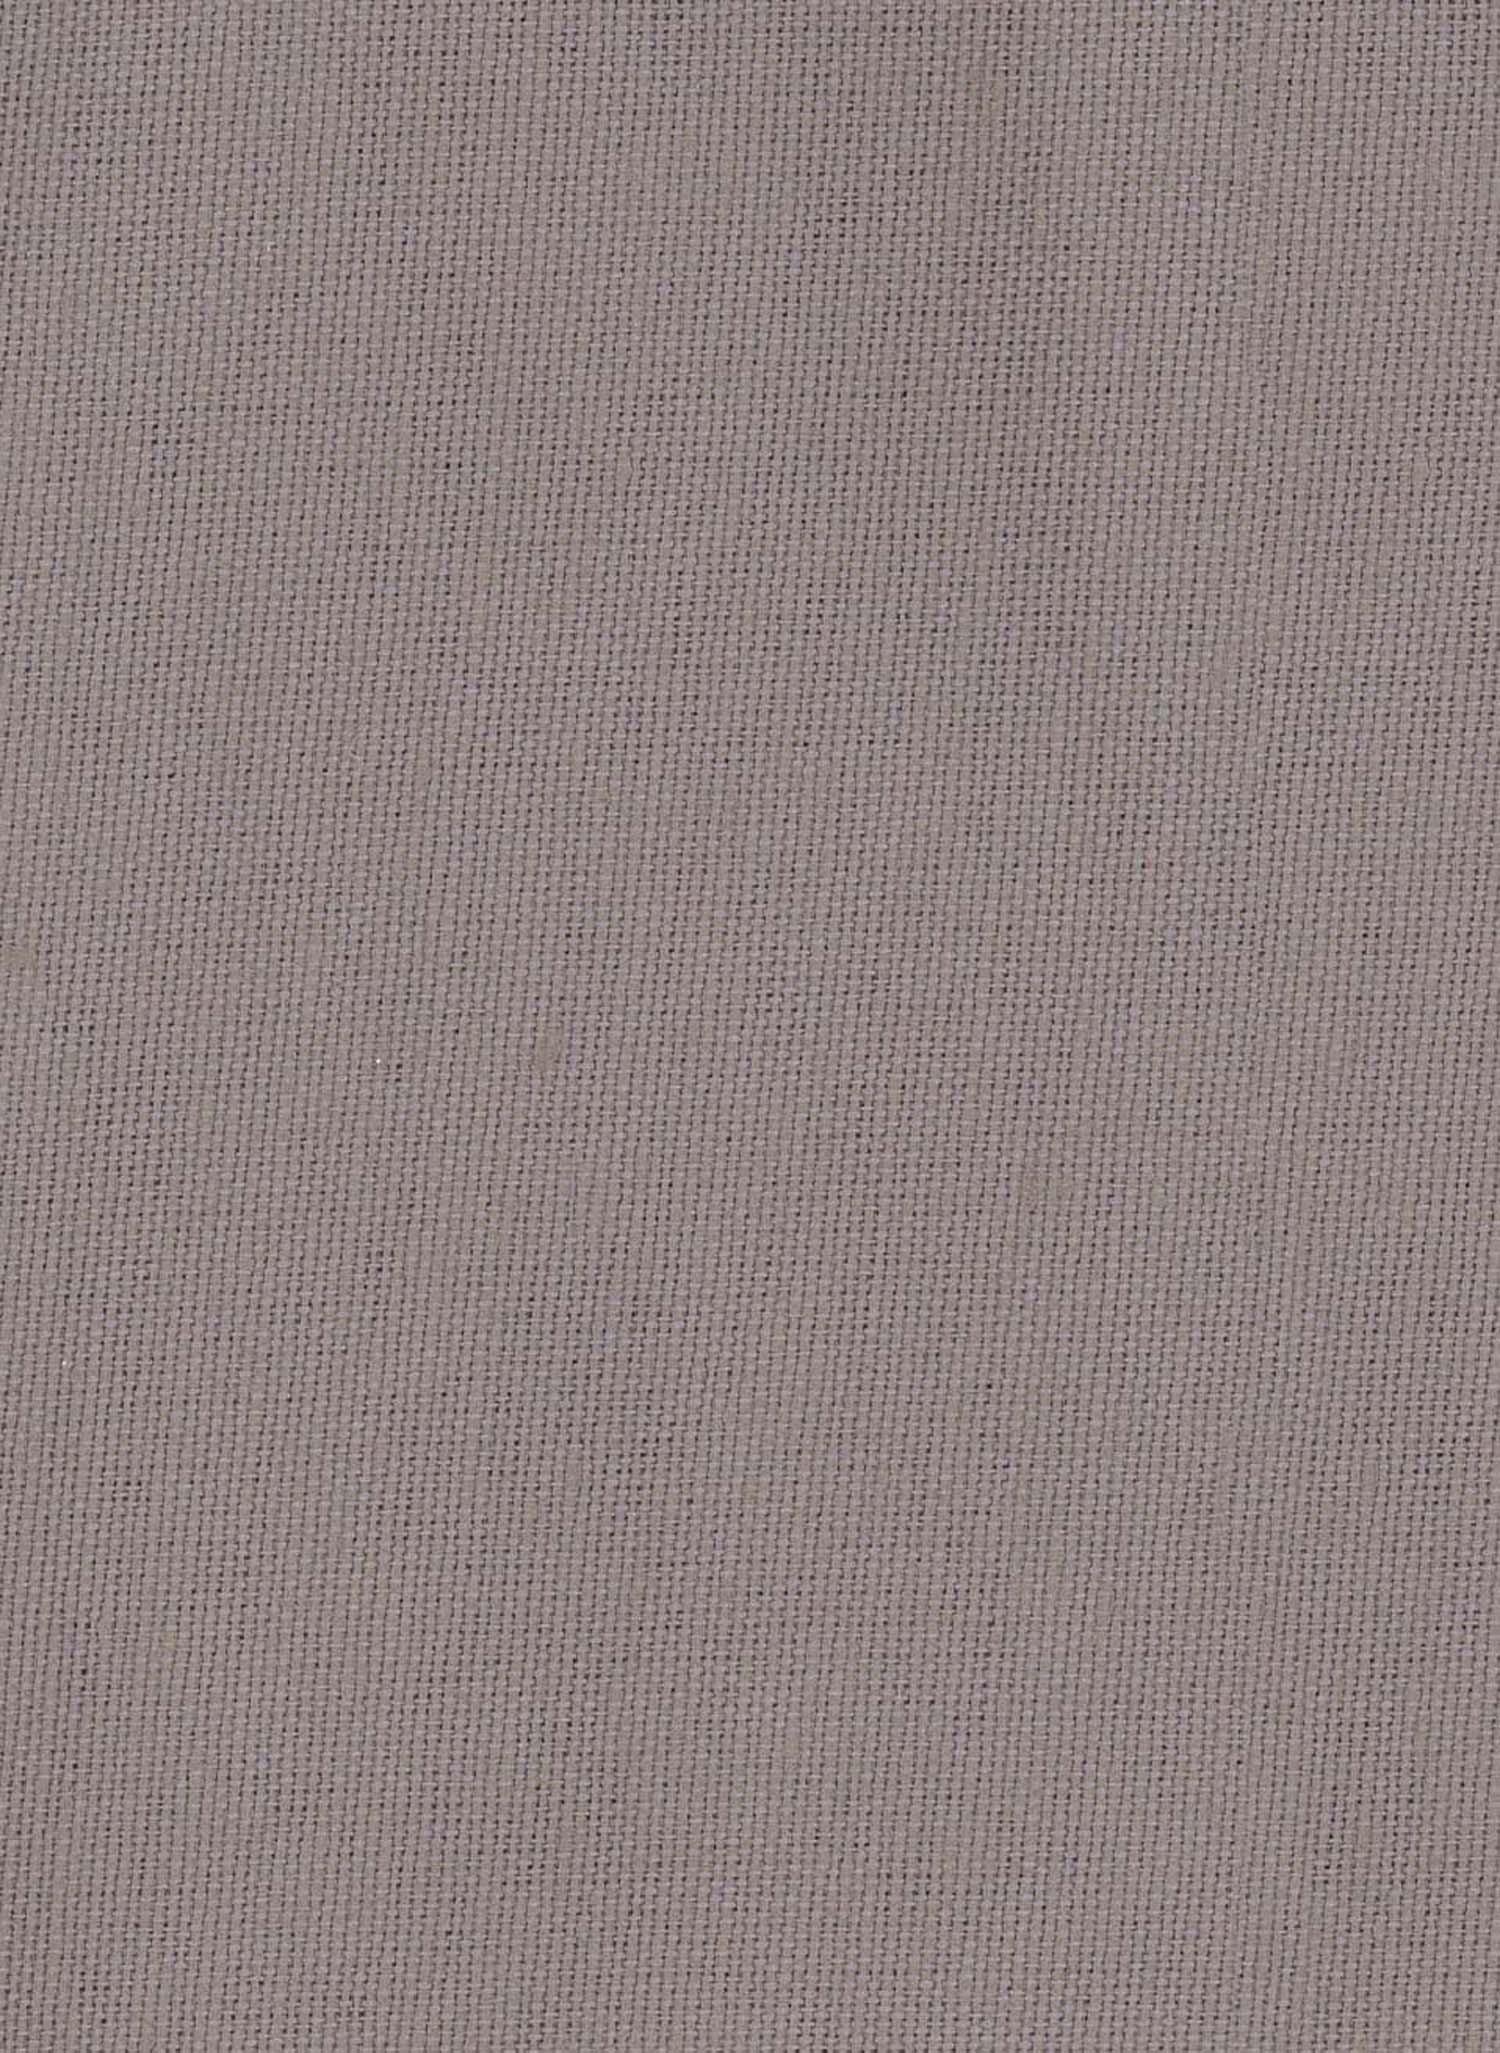 Stuhl-Überzug,2er Set grau - 1 - Ronja.ch